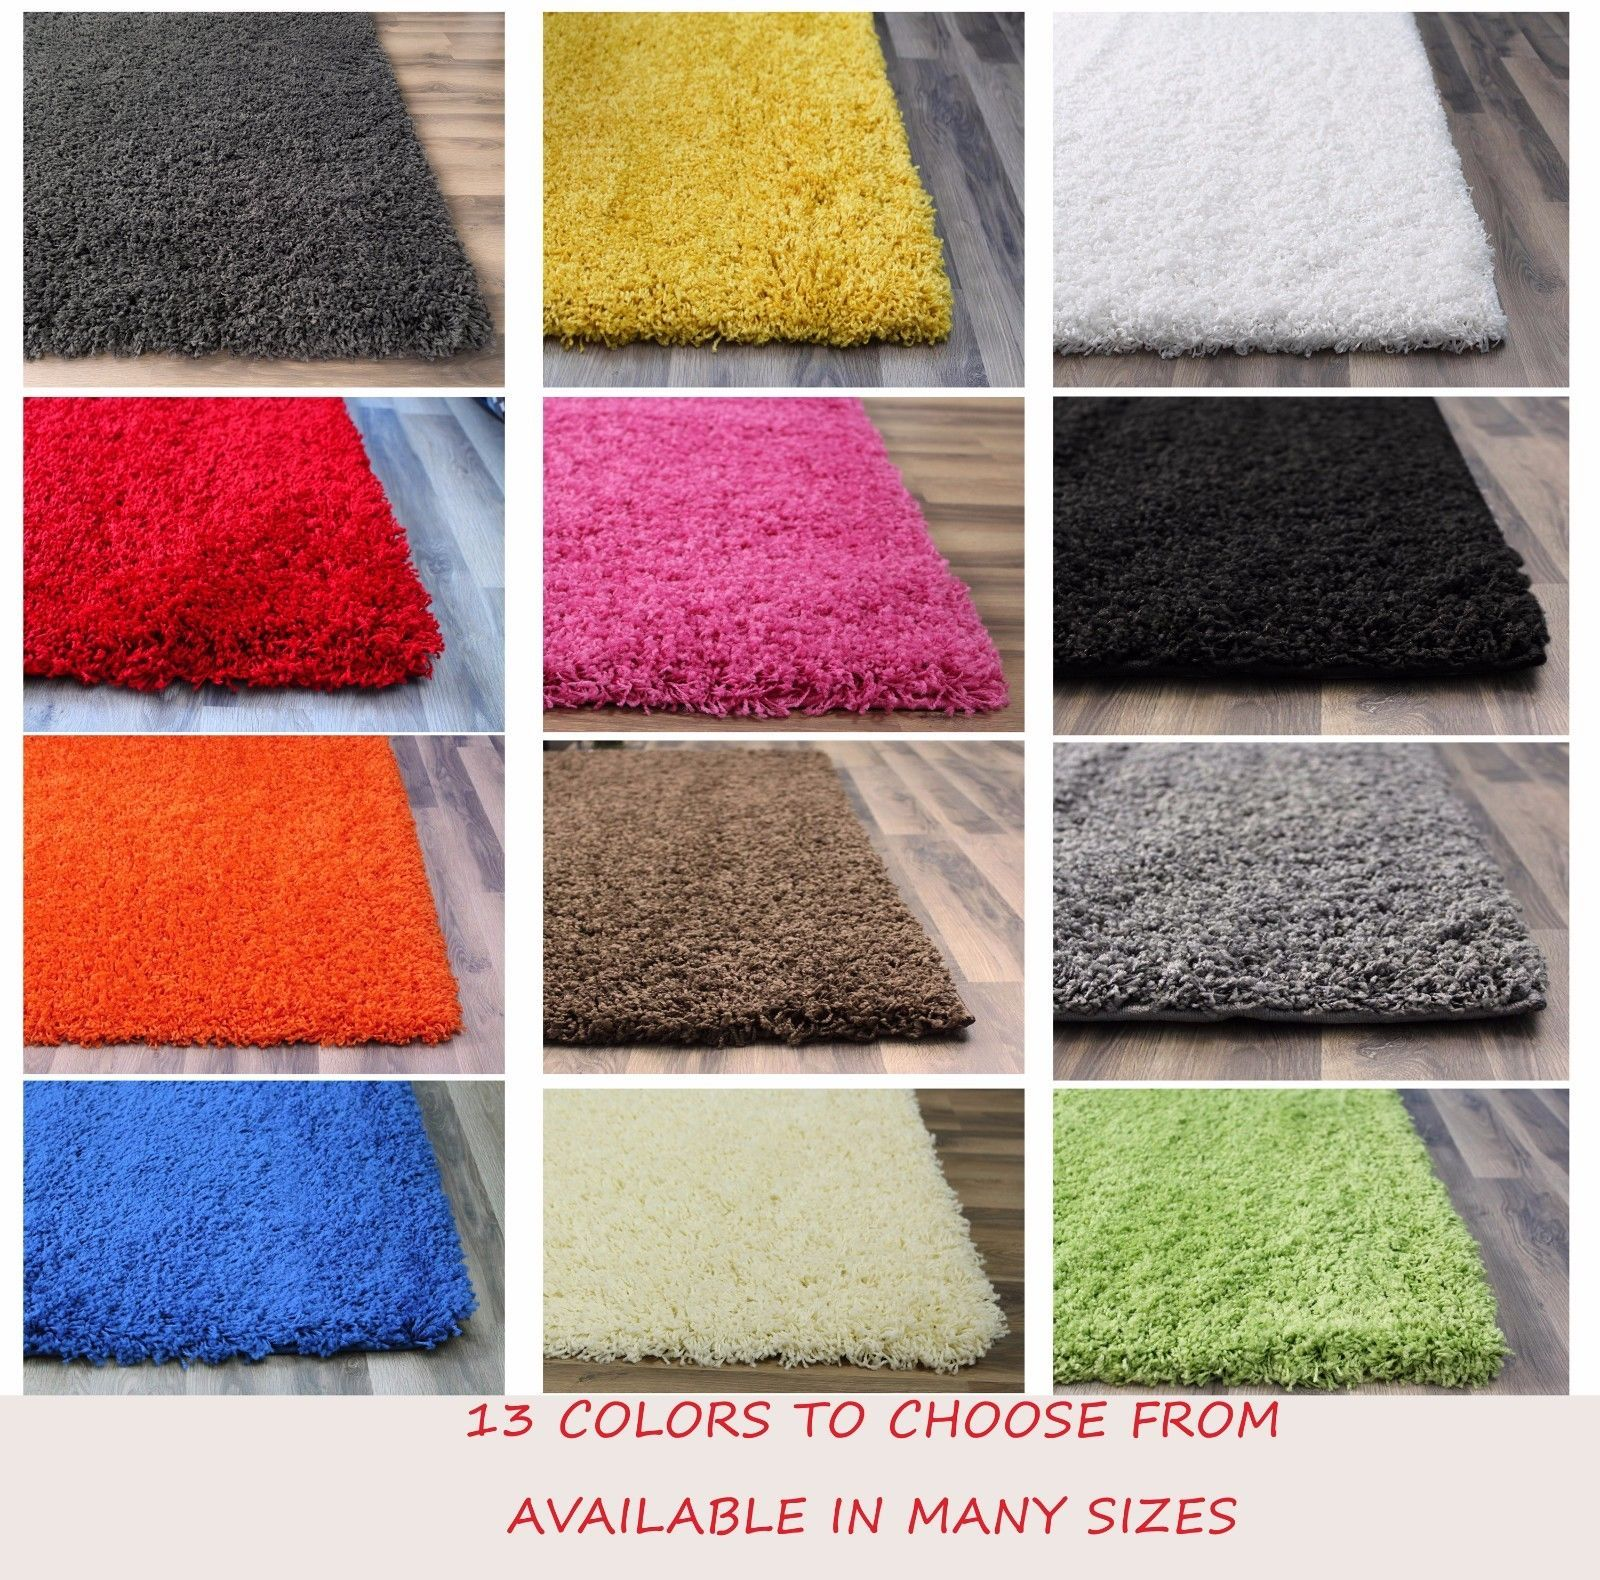 cool SHAG CLEARANCE AREA RUGS CARPET AREA RUG FLOOR DECOR SOLID SHAG RUGS SALE   Check more at http://harmonisproduction.com/shag-clearance-area-rugs-carpet-area-rug-floor-decor-solid-shag-rugs-sale/